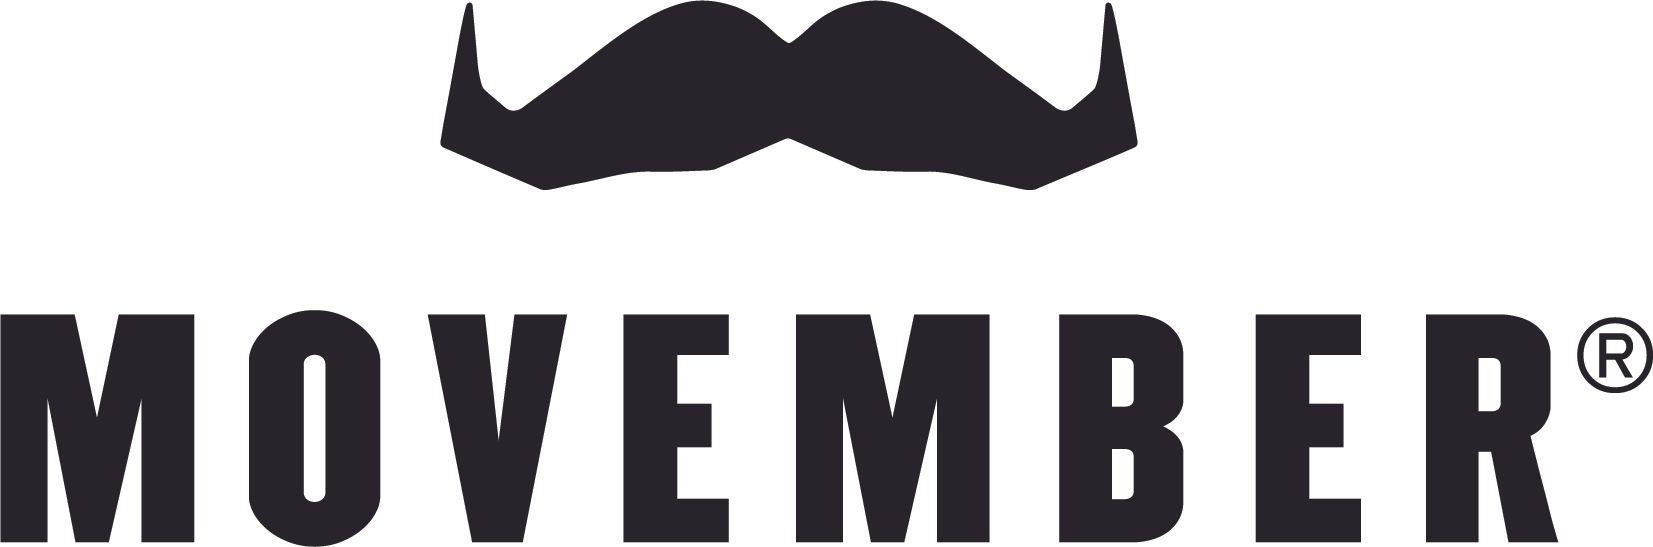 Movember Europe